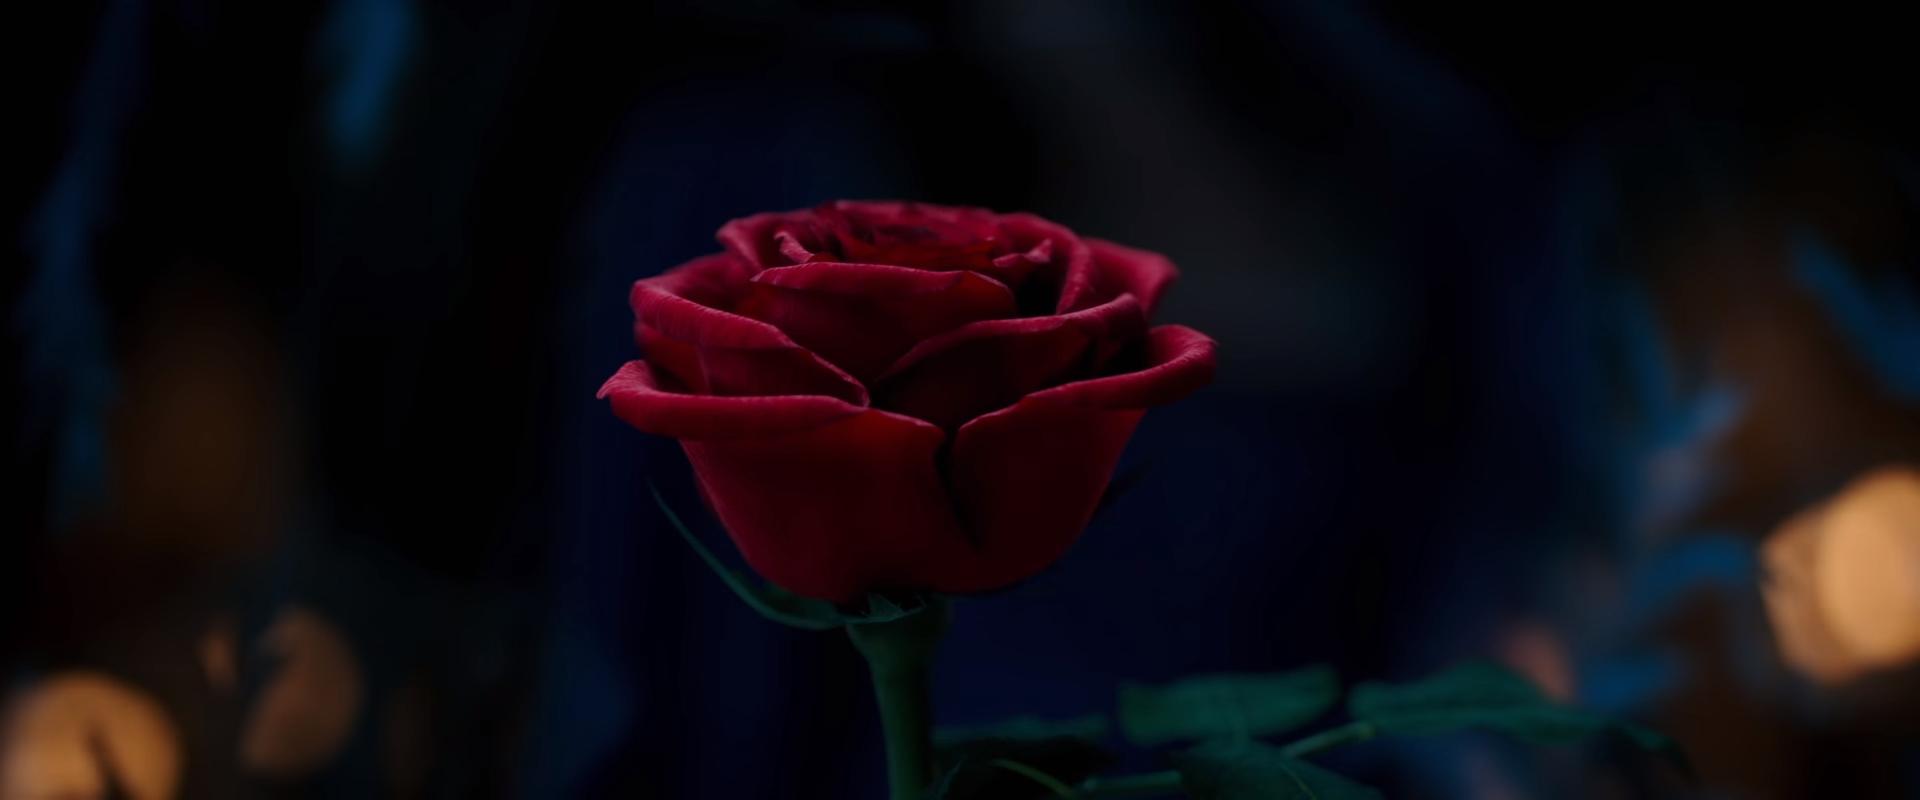 Beauty Beast Trailer on Latest Writing A Press Release